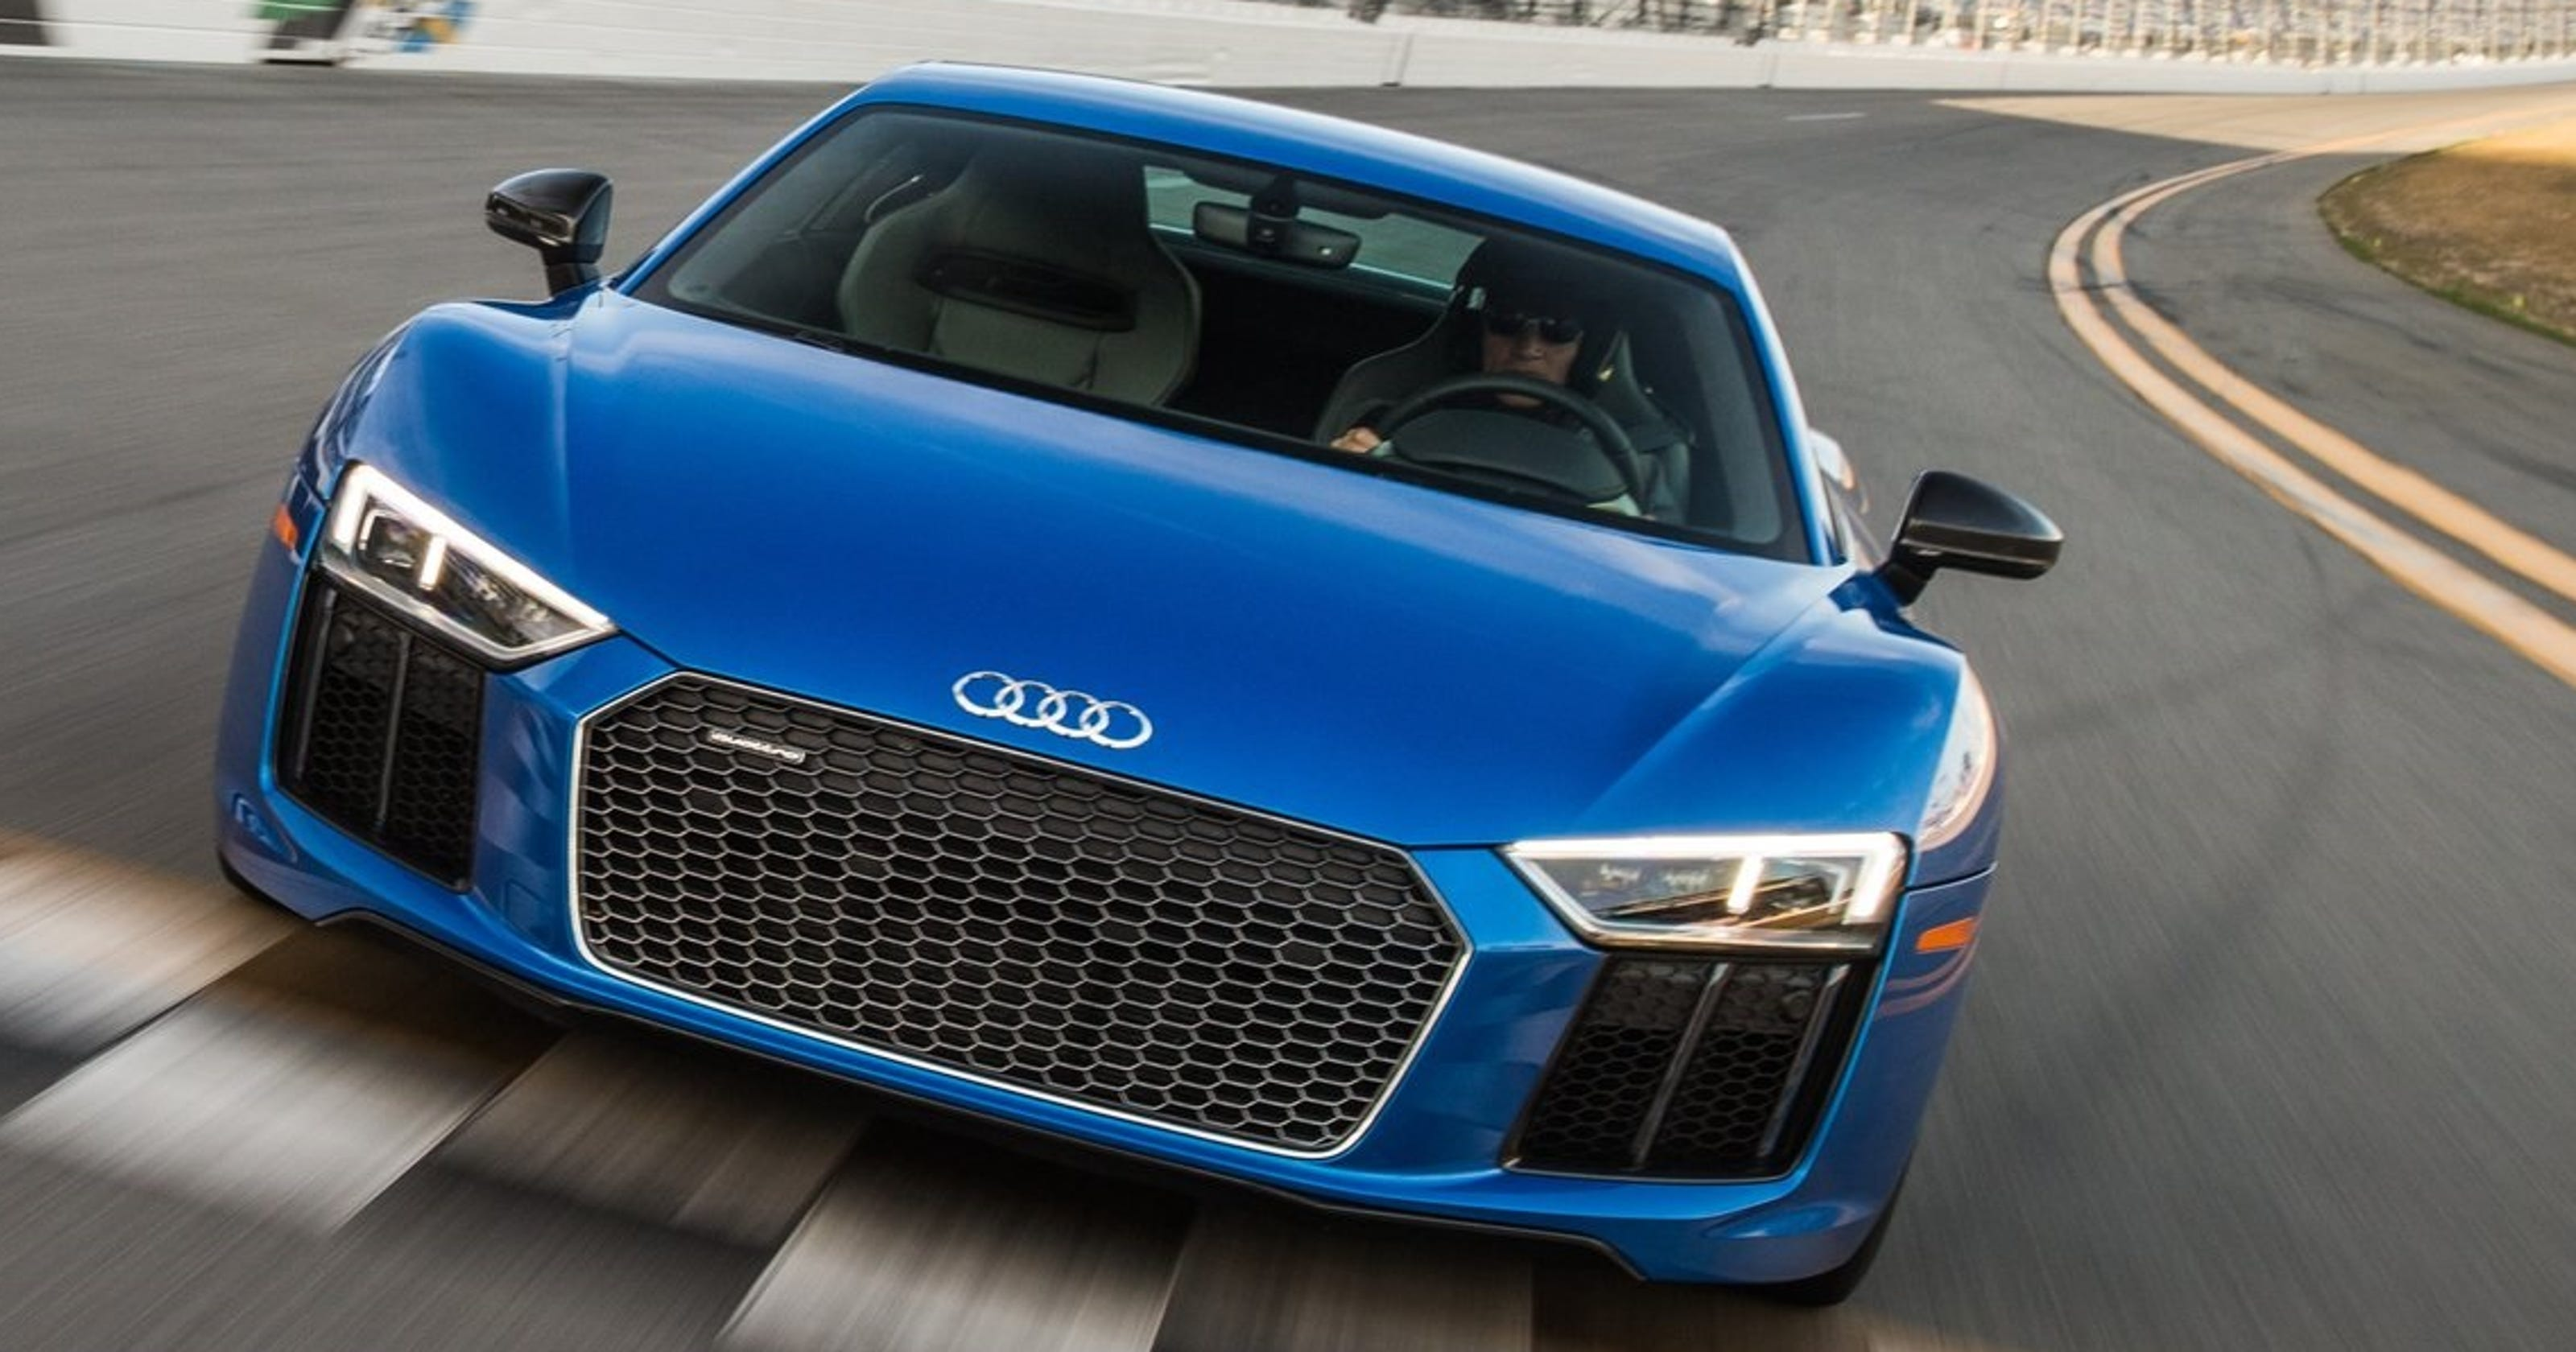 Review Audis New R V Plus Supercar Fit For Iron Man - Audi i8